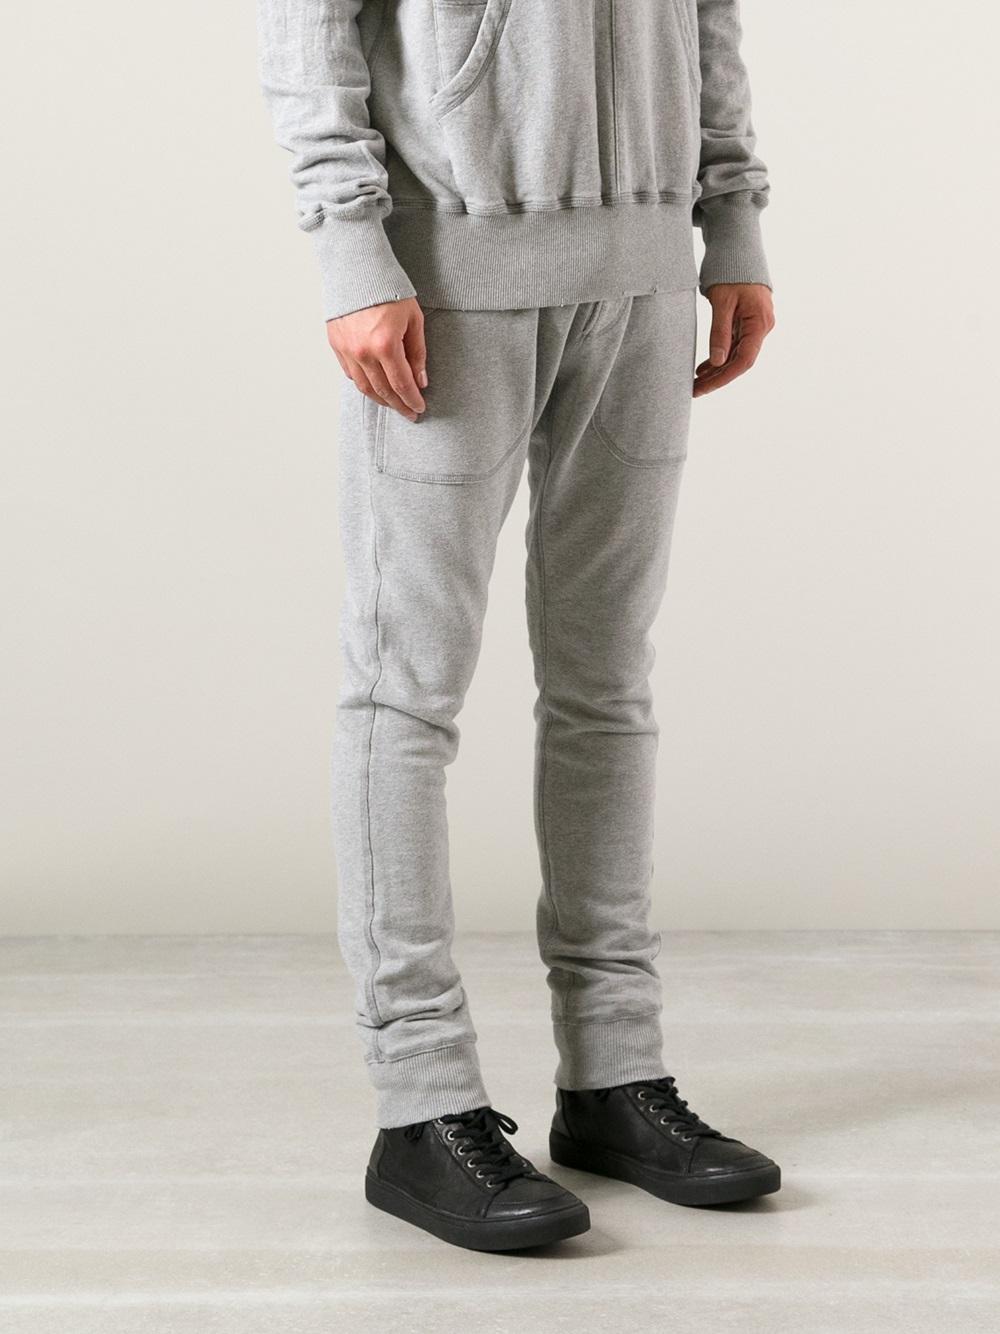 caaa6db5e8b Balmain Tracksuit Trouser in Gray for Men - Lyst